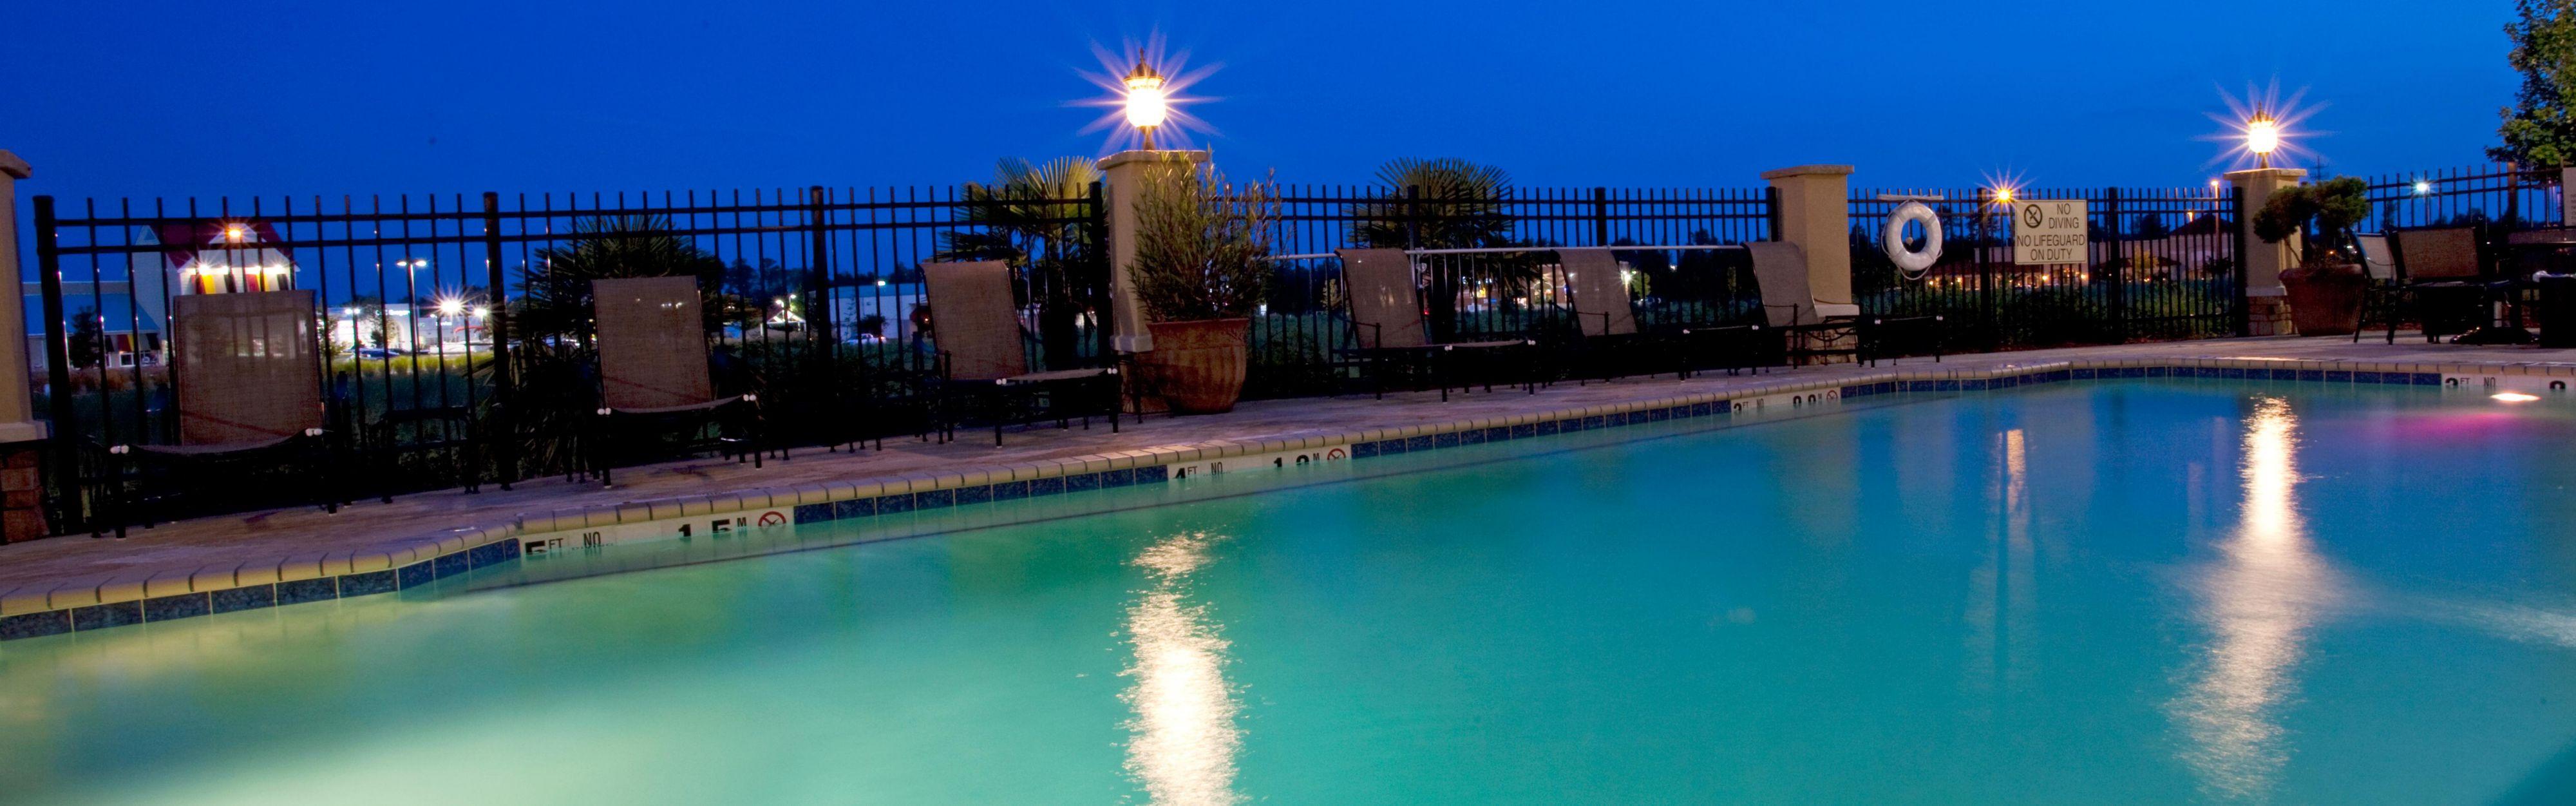 Holiday Inn Express & Suites Columbus At Northlake image 2